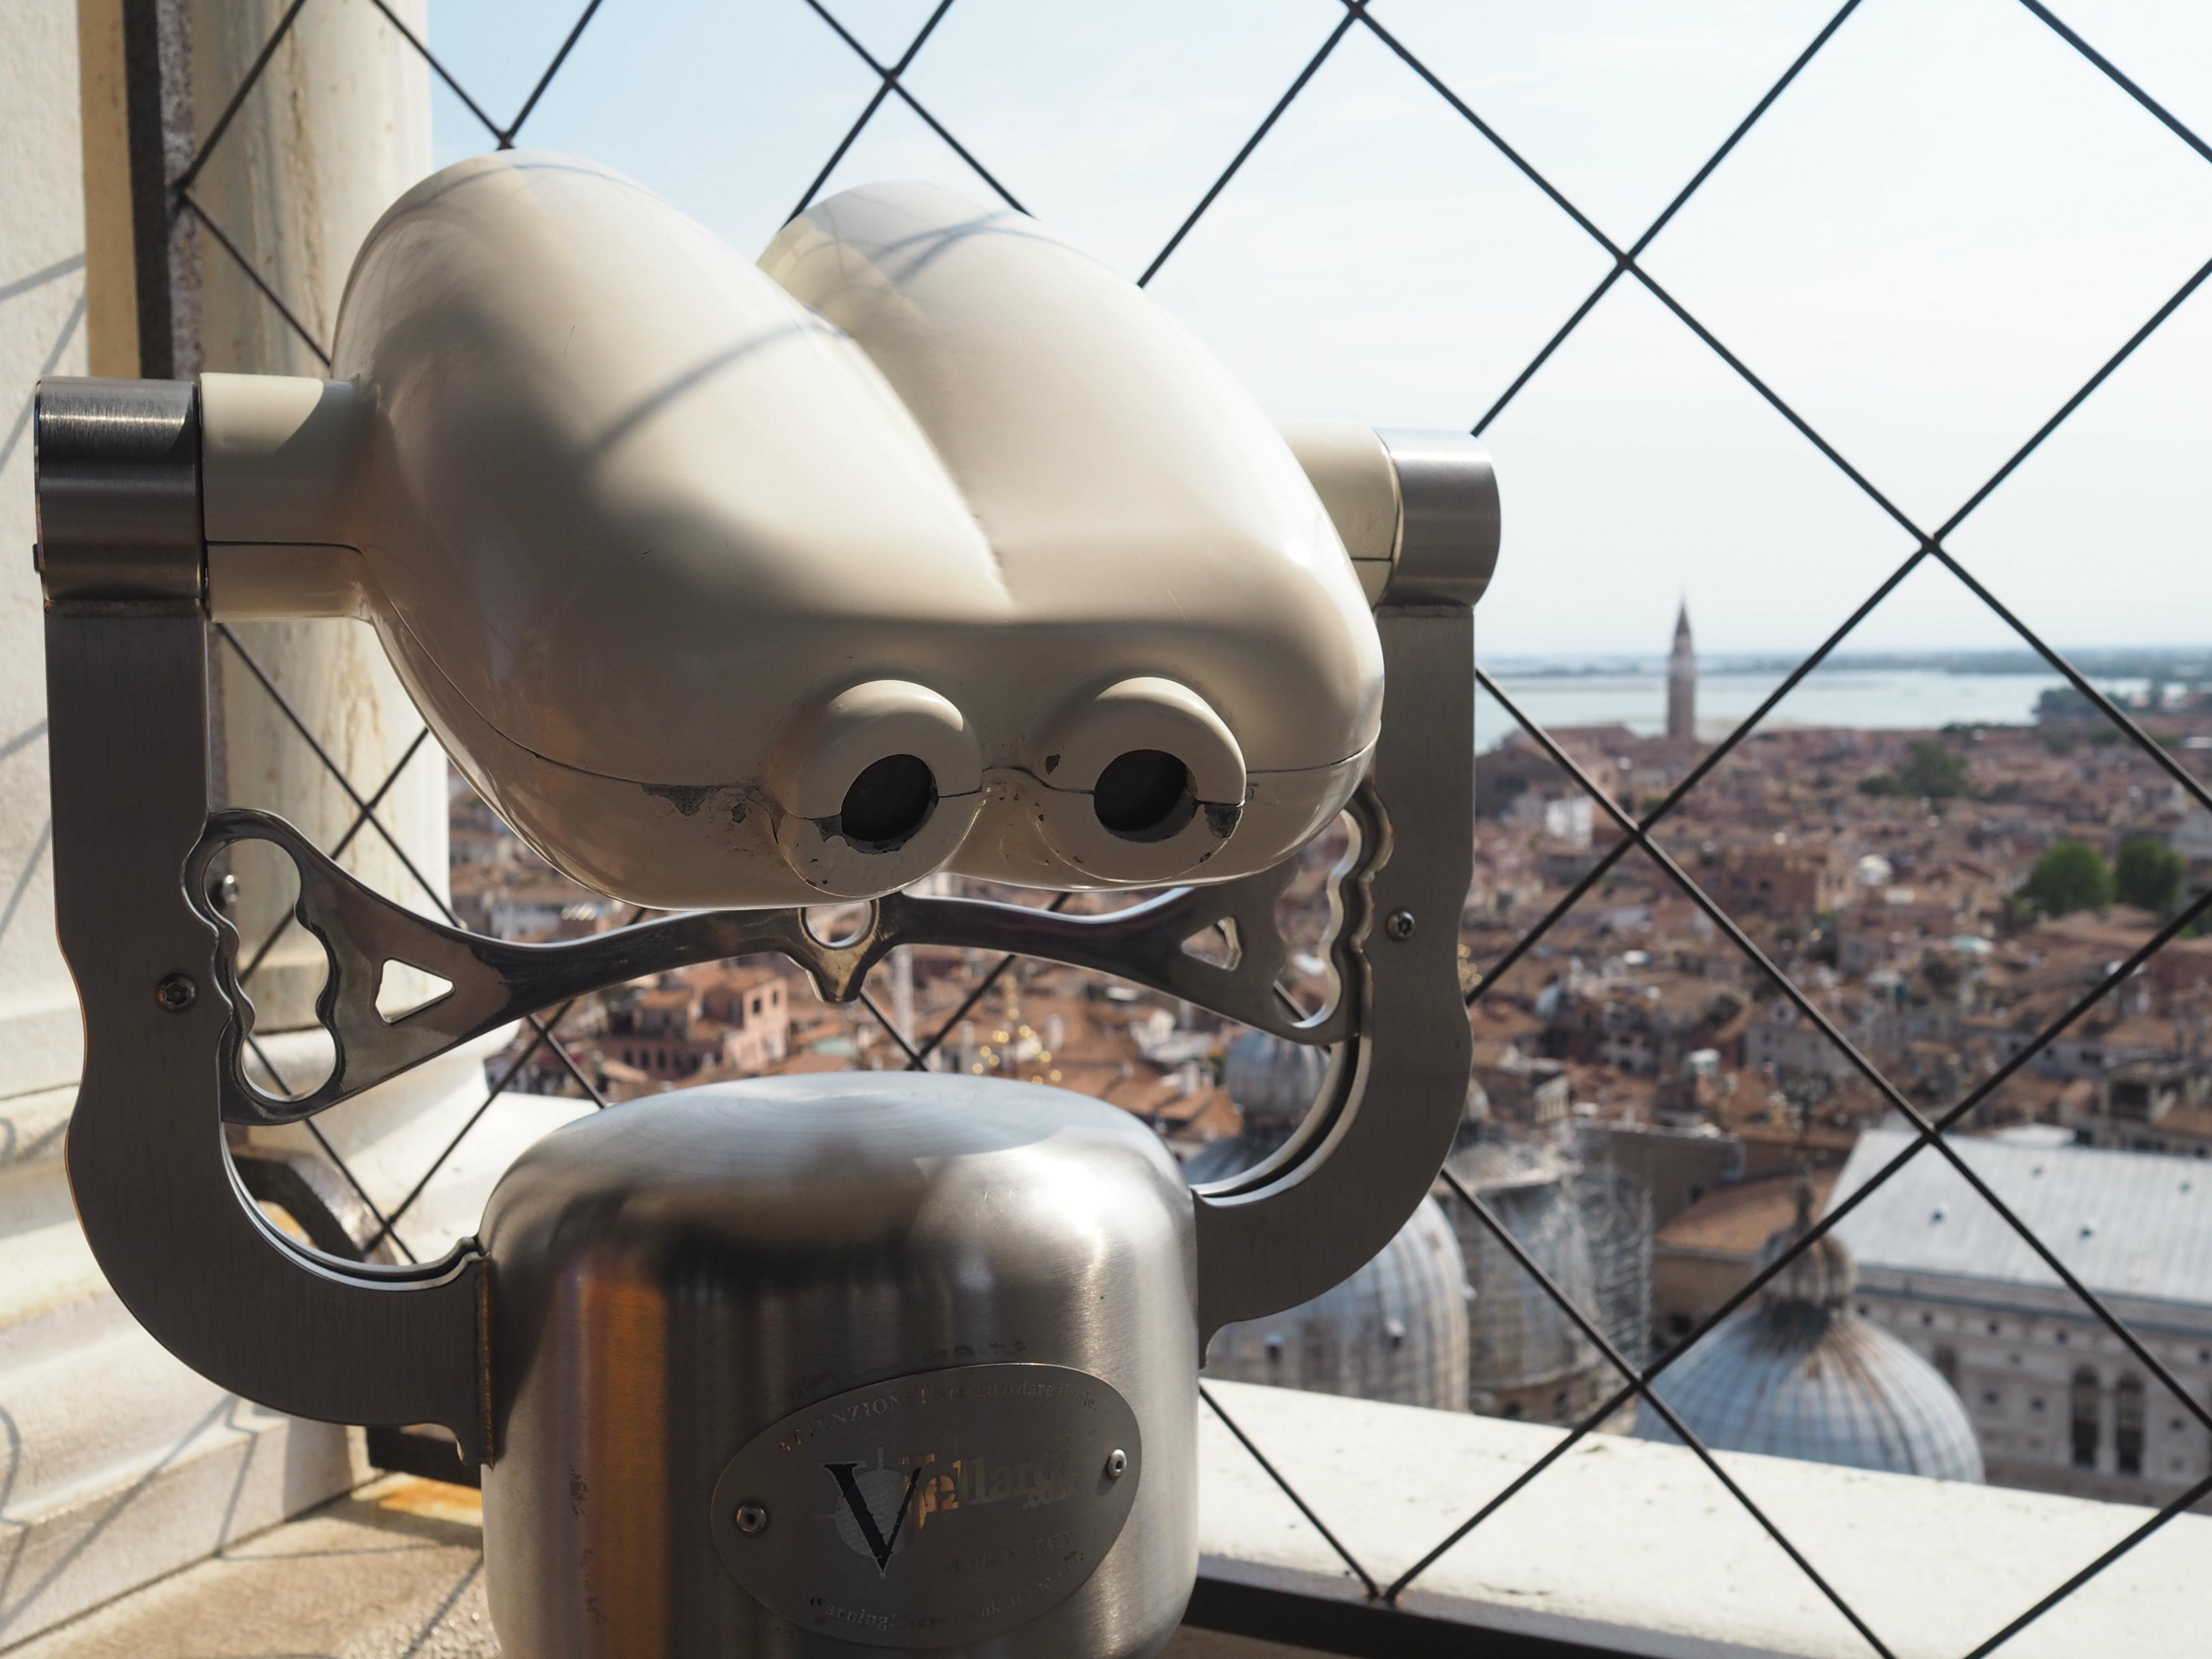 näköalatorni-venetsia.jpg